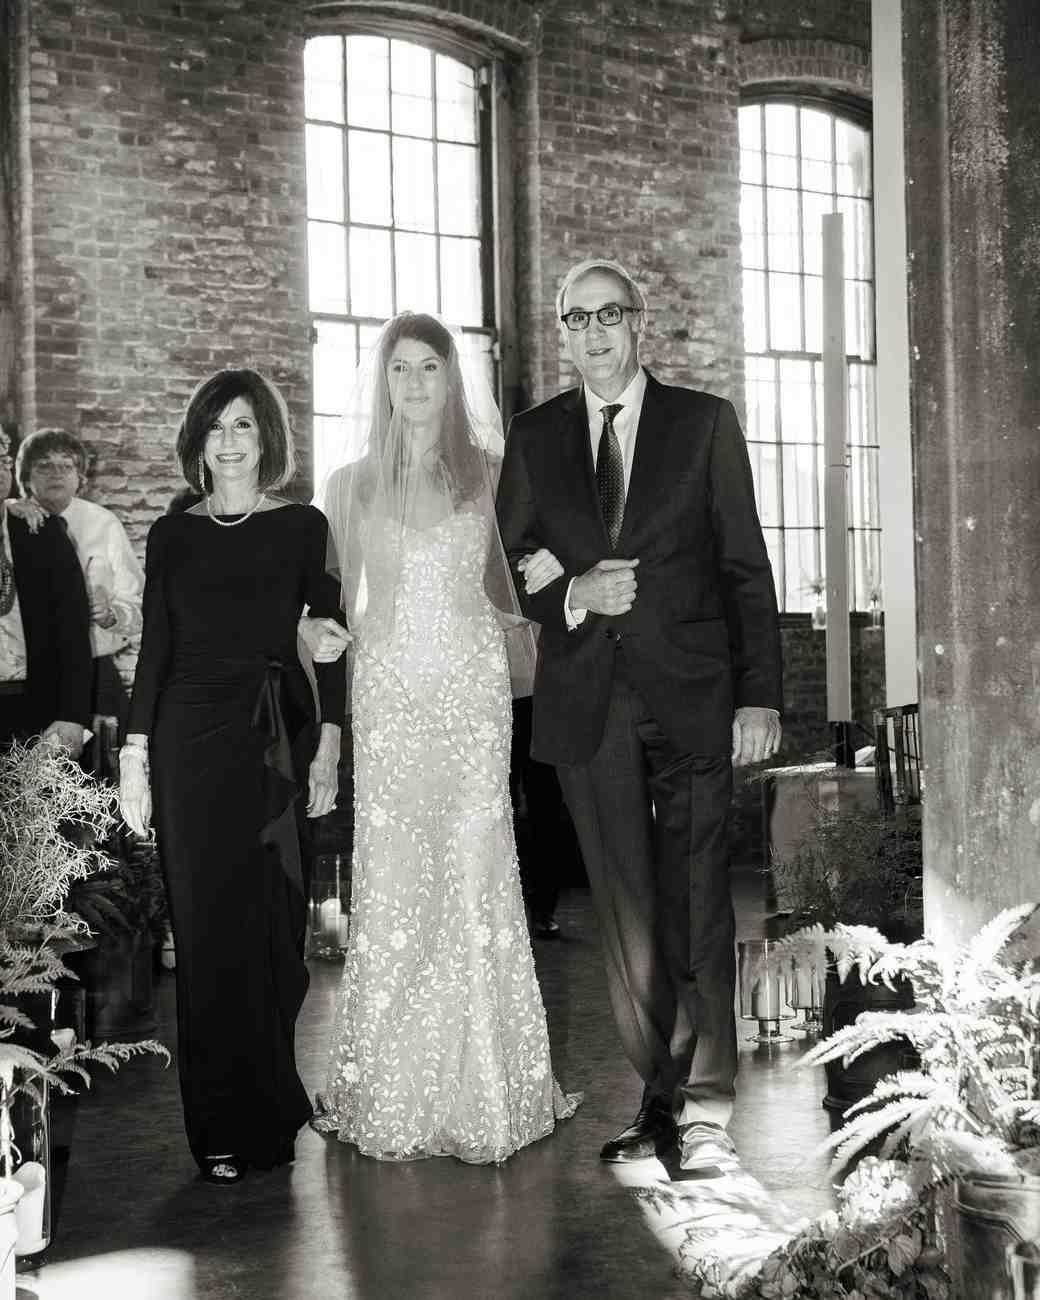 emily-josh-wedding-entrance-0107-s112719-0216.jpg